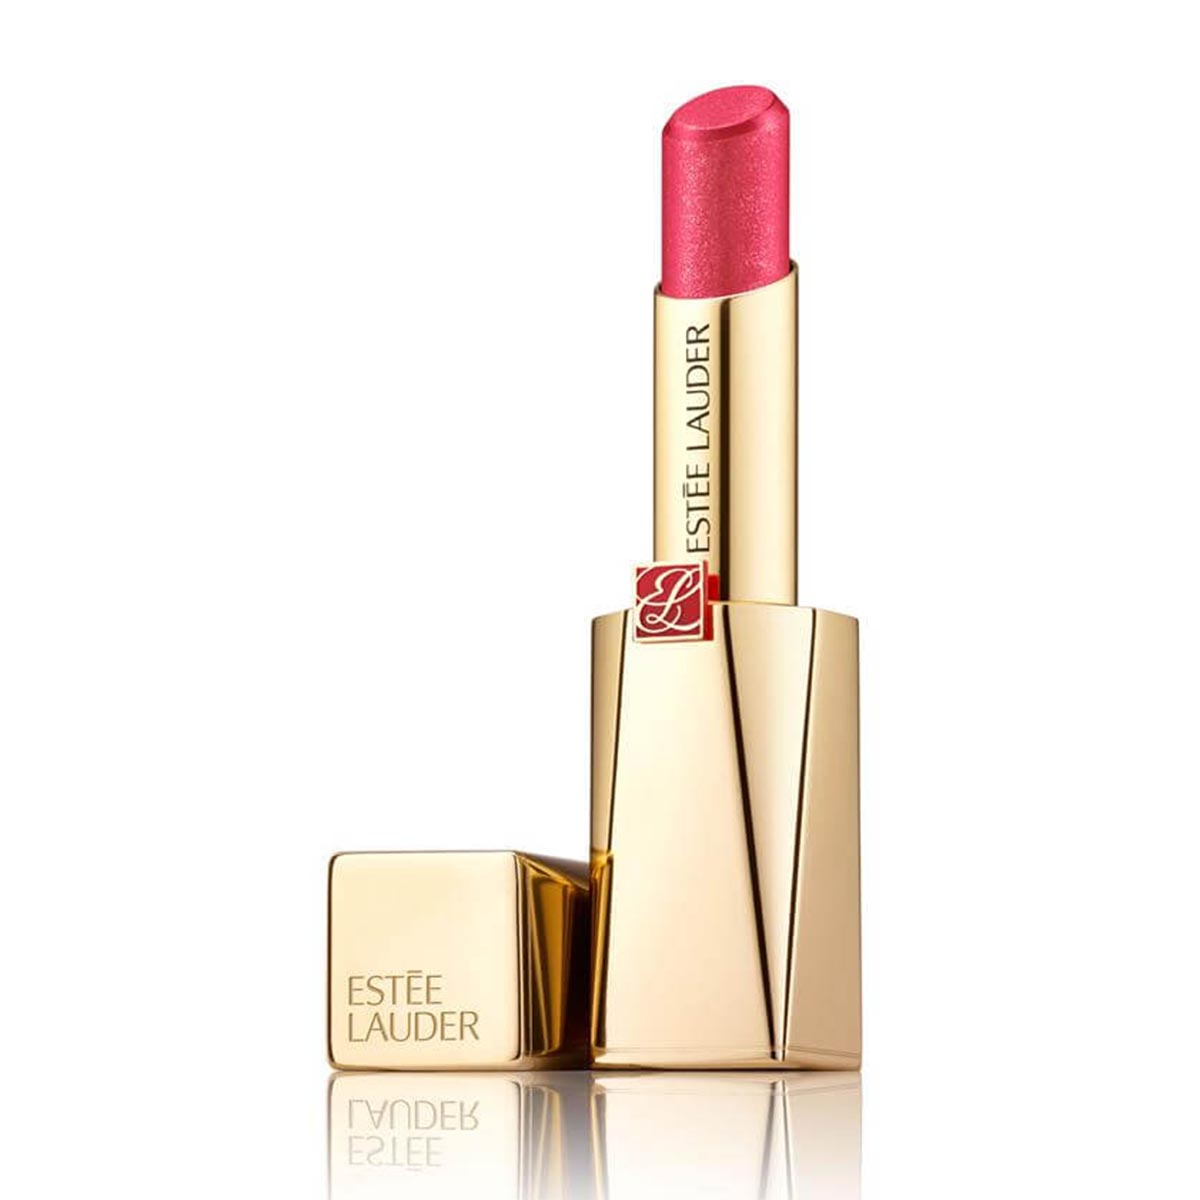 Estee lauder pure color desire rouge lipstick 203